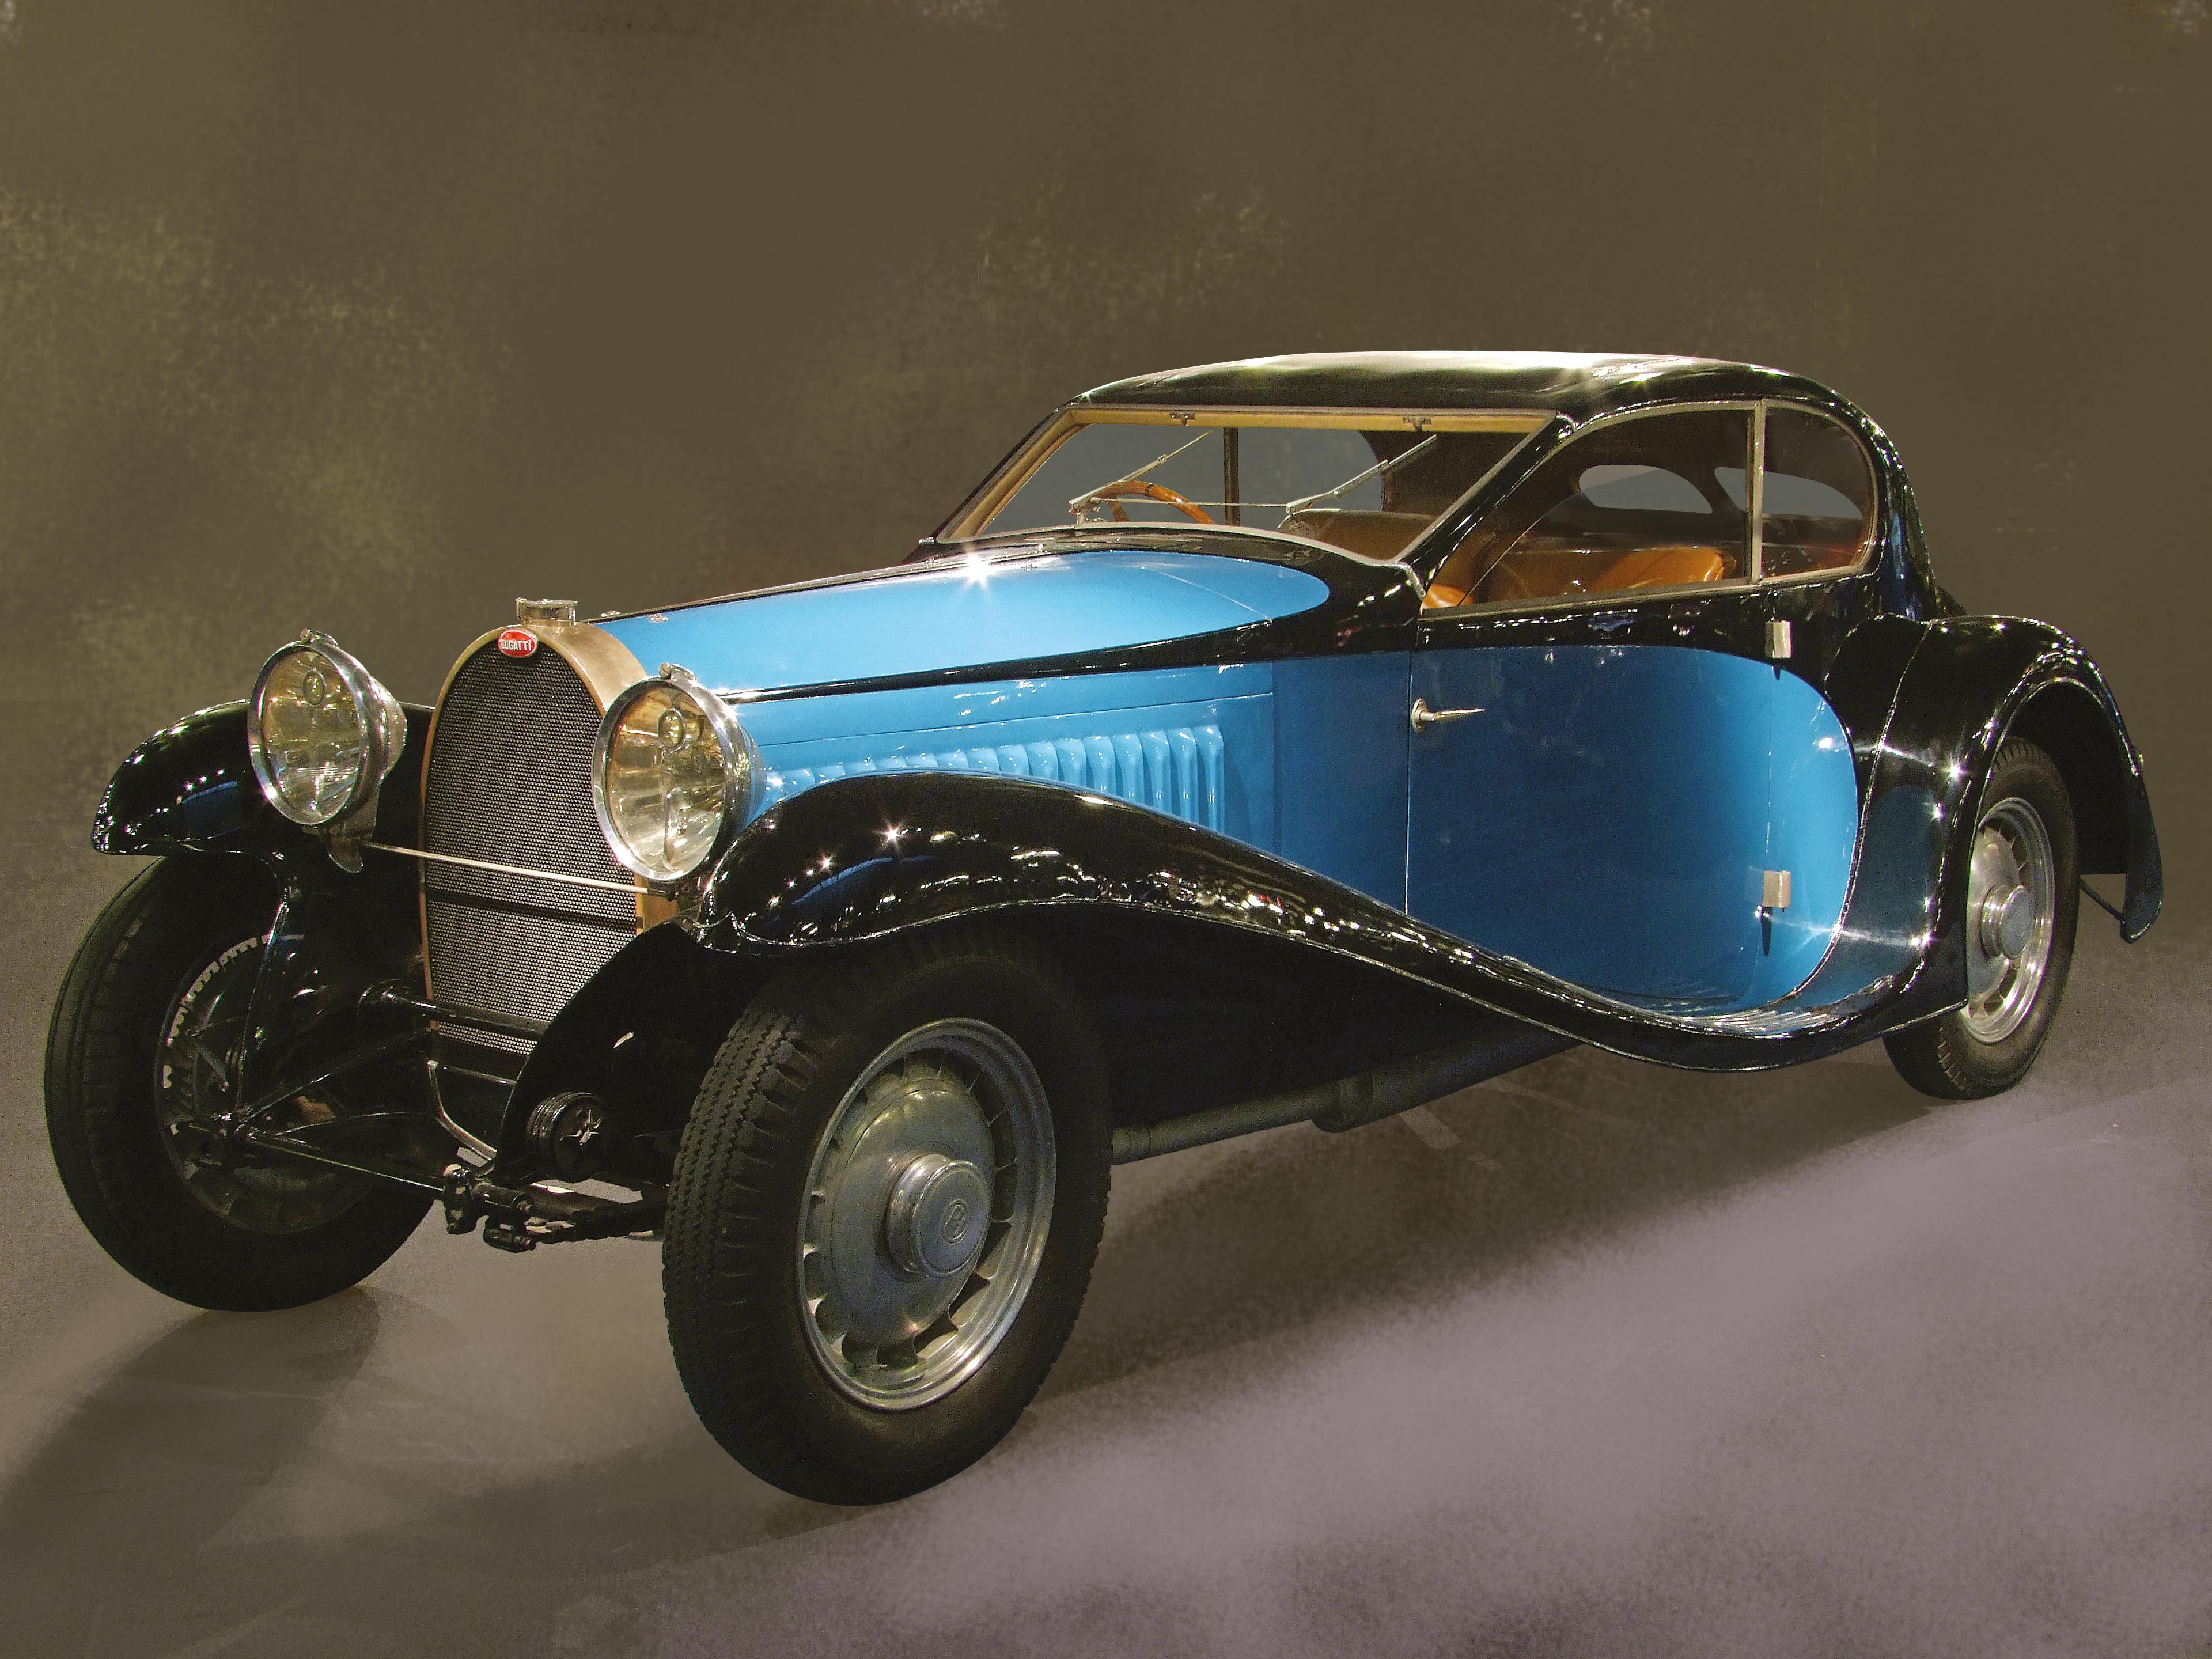 Major European Museums Combine For Car Showcase At InterClassics - Classic car showcase